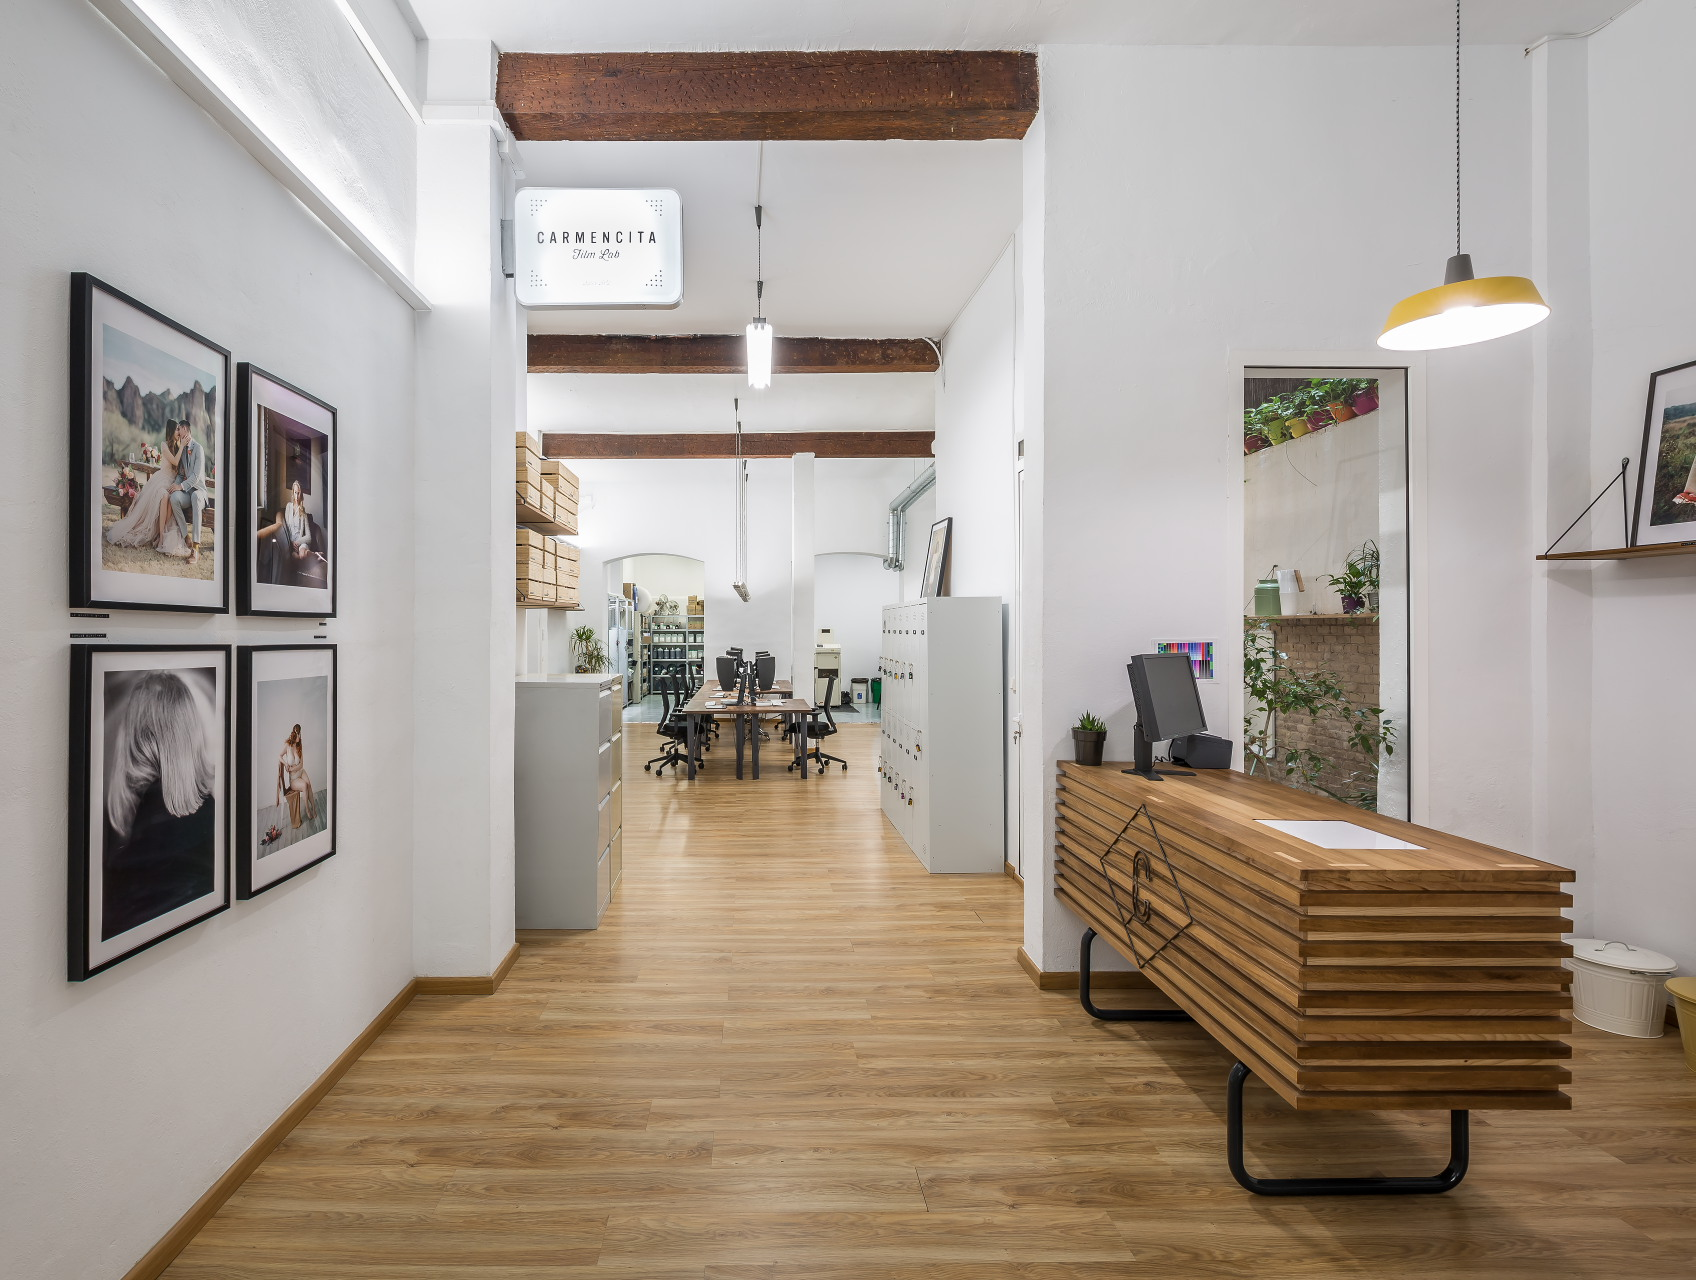 fotografia-arquitectura-interiorismo-valencia-german-cabo-boubau-carmencita-carmencitafilmlab (10)